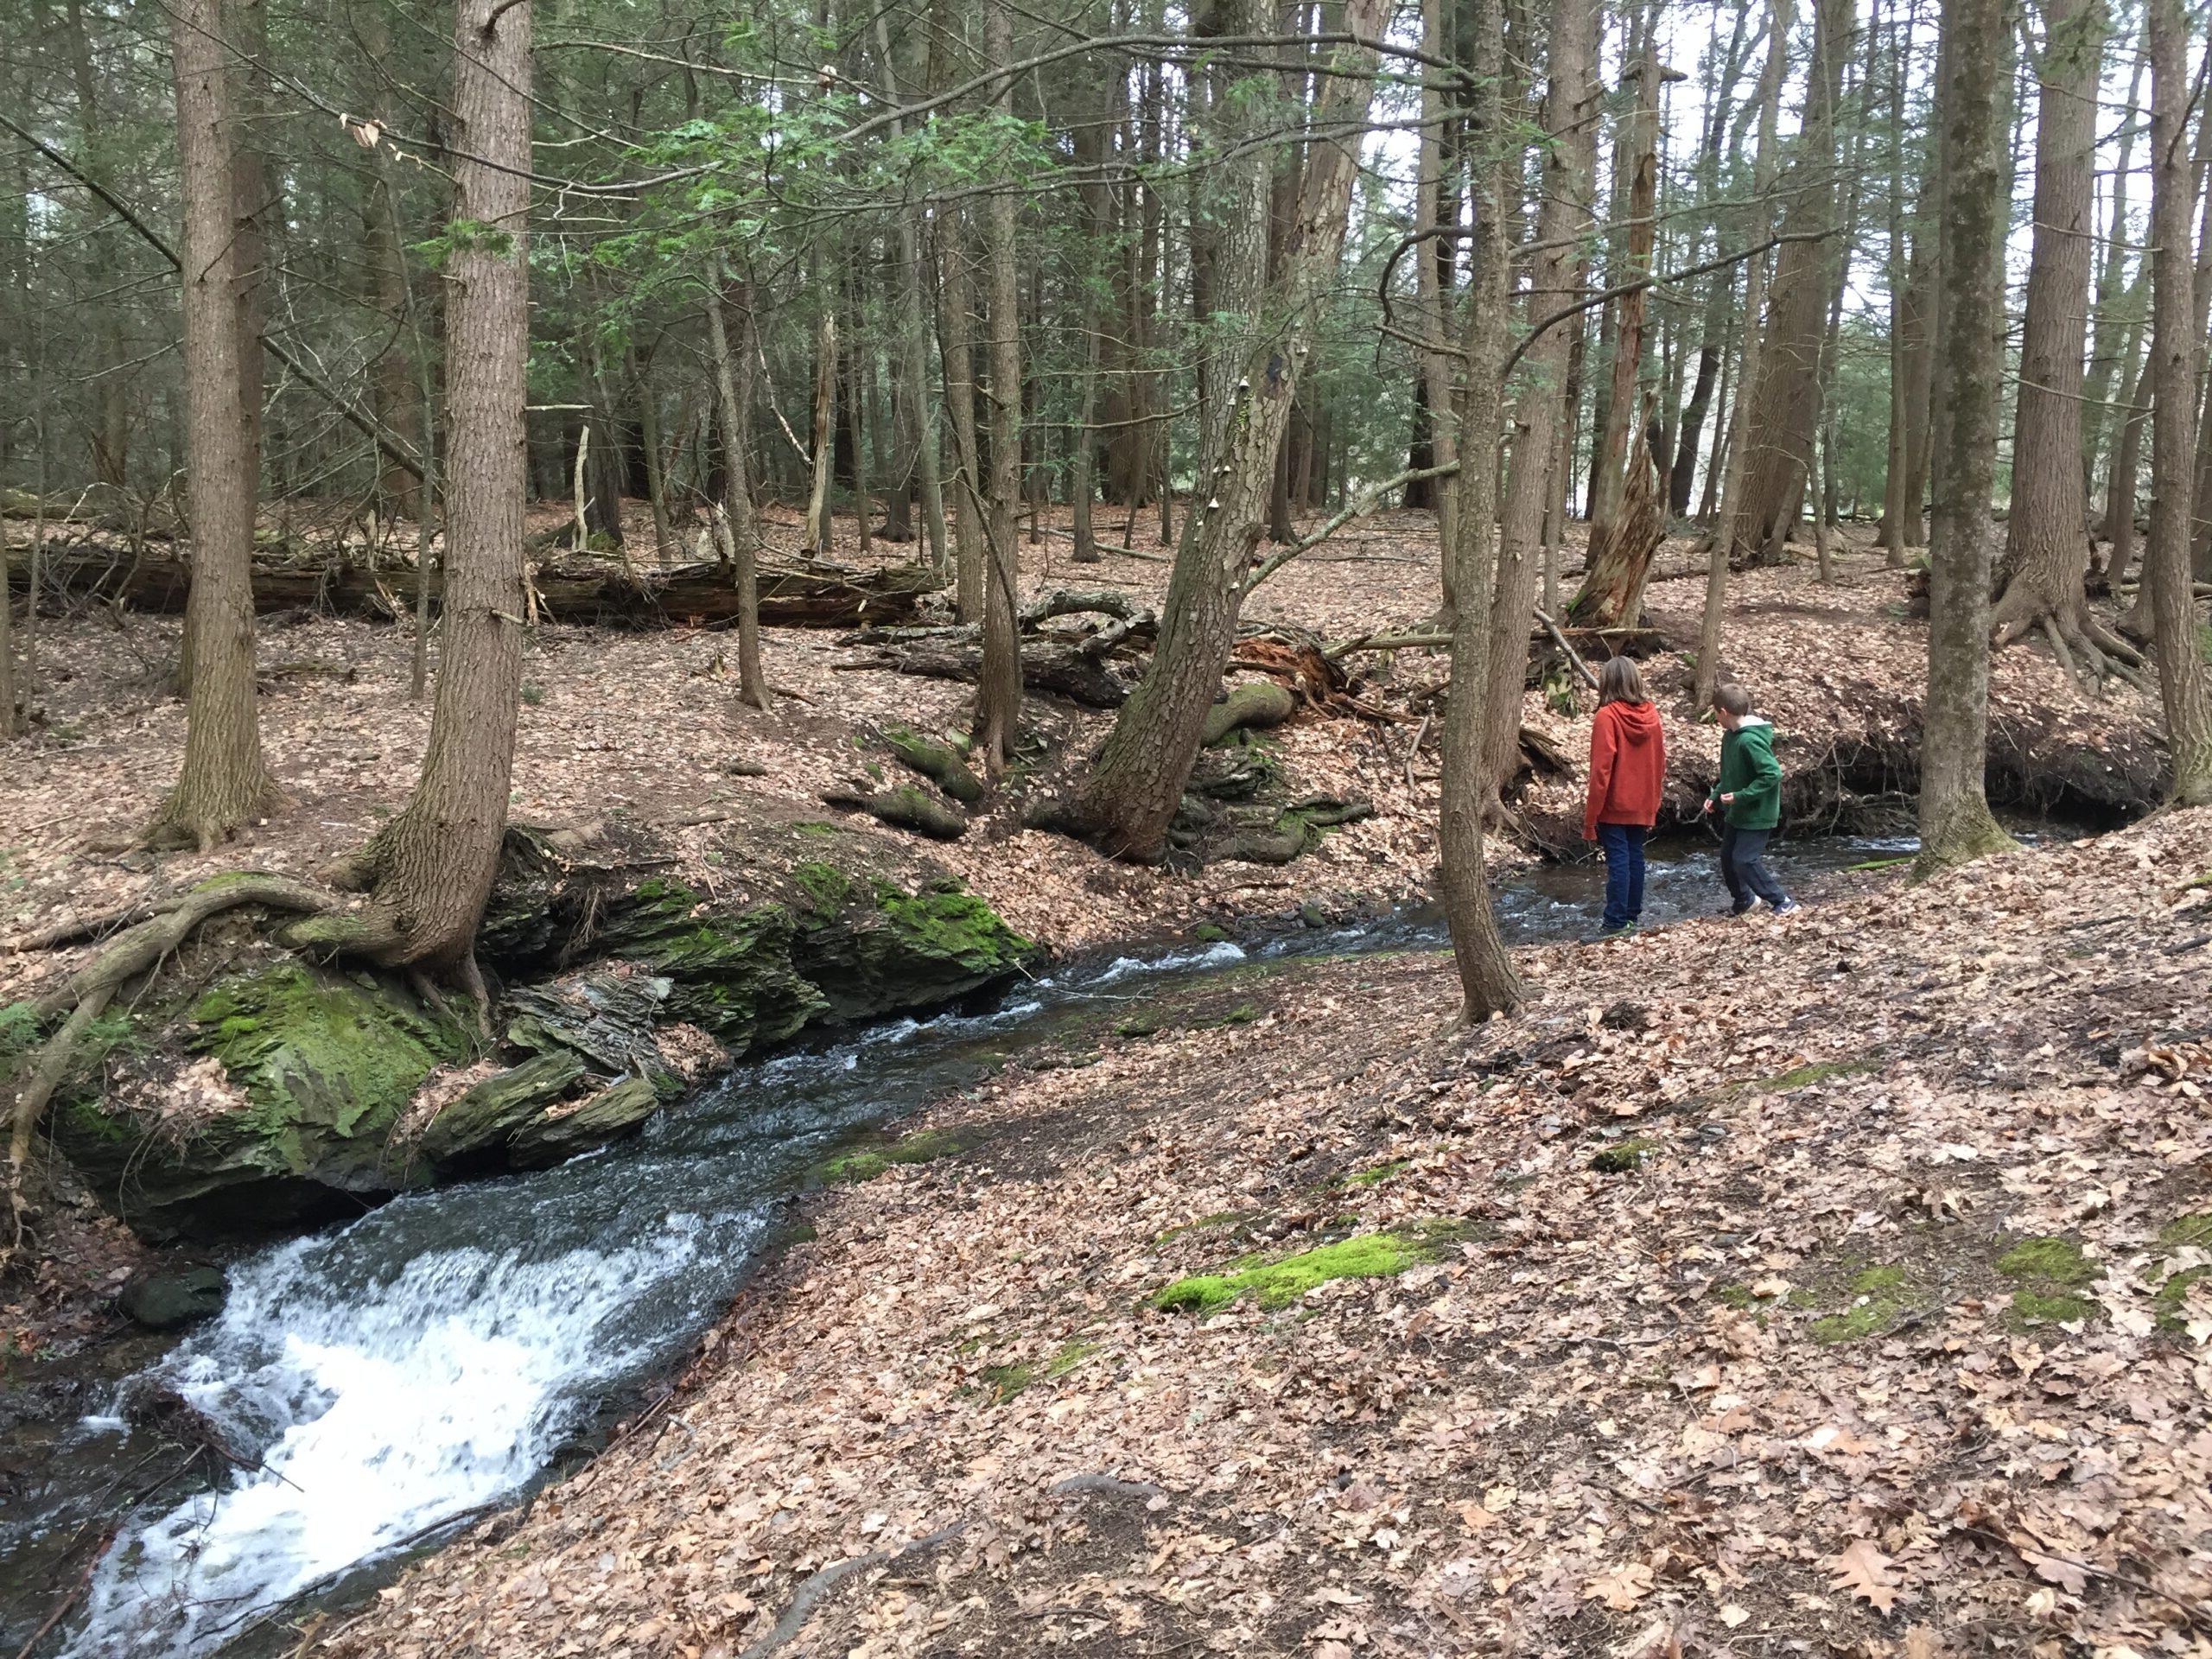 Kids playing by river among hemlocks